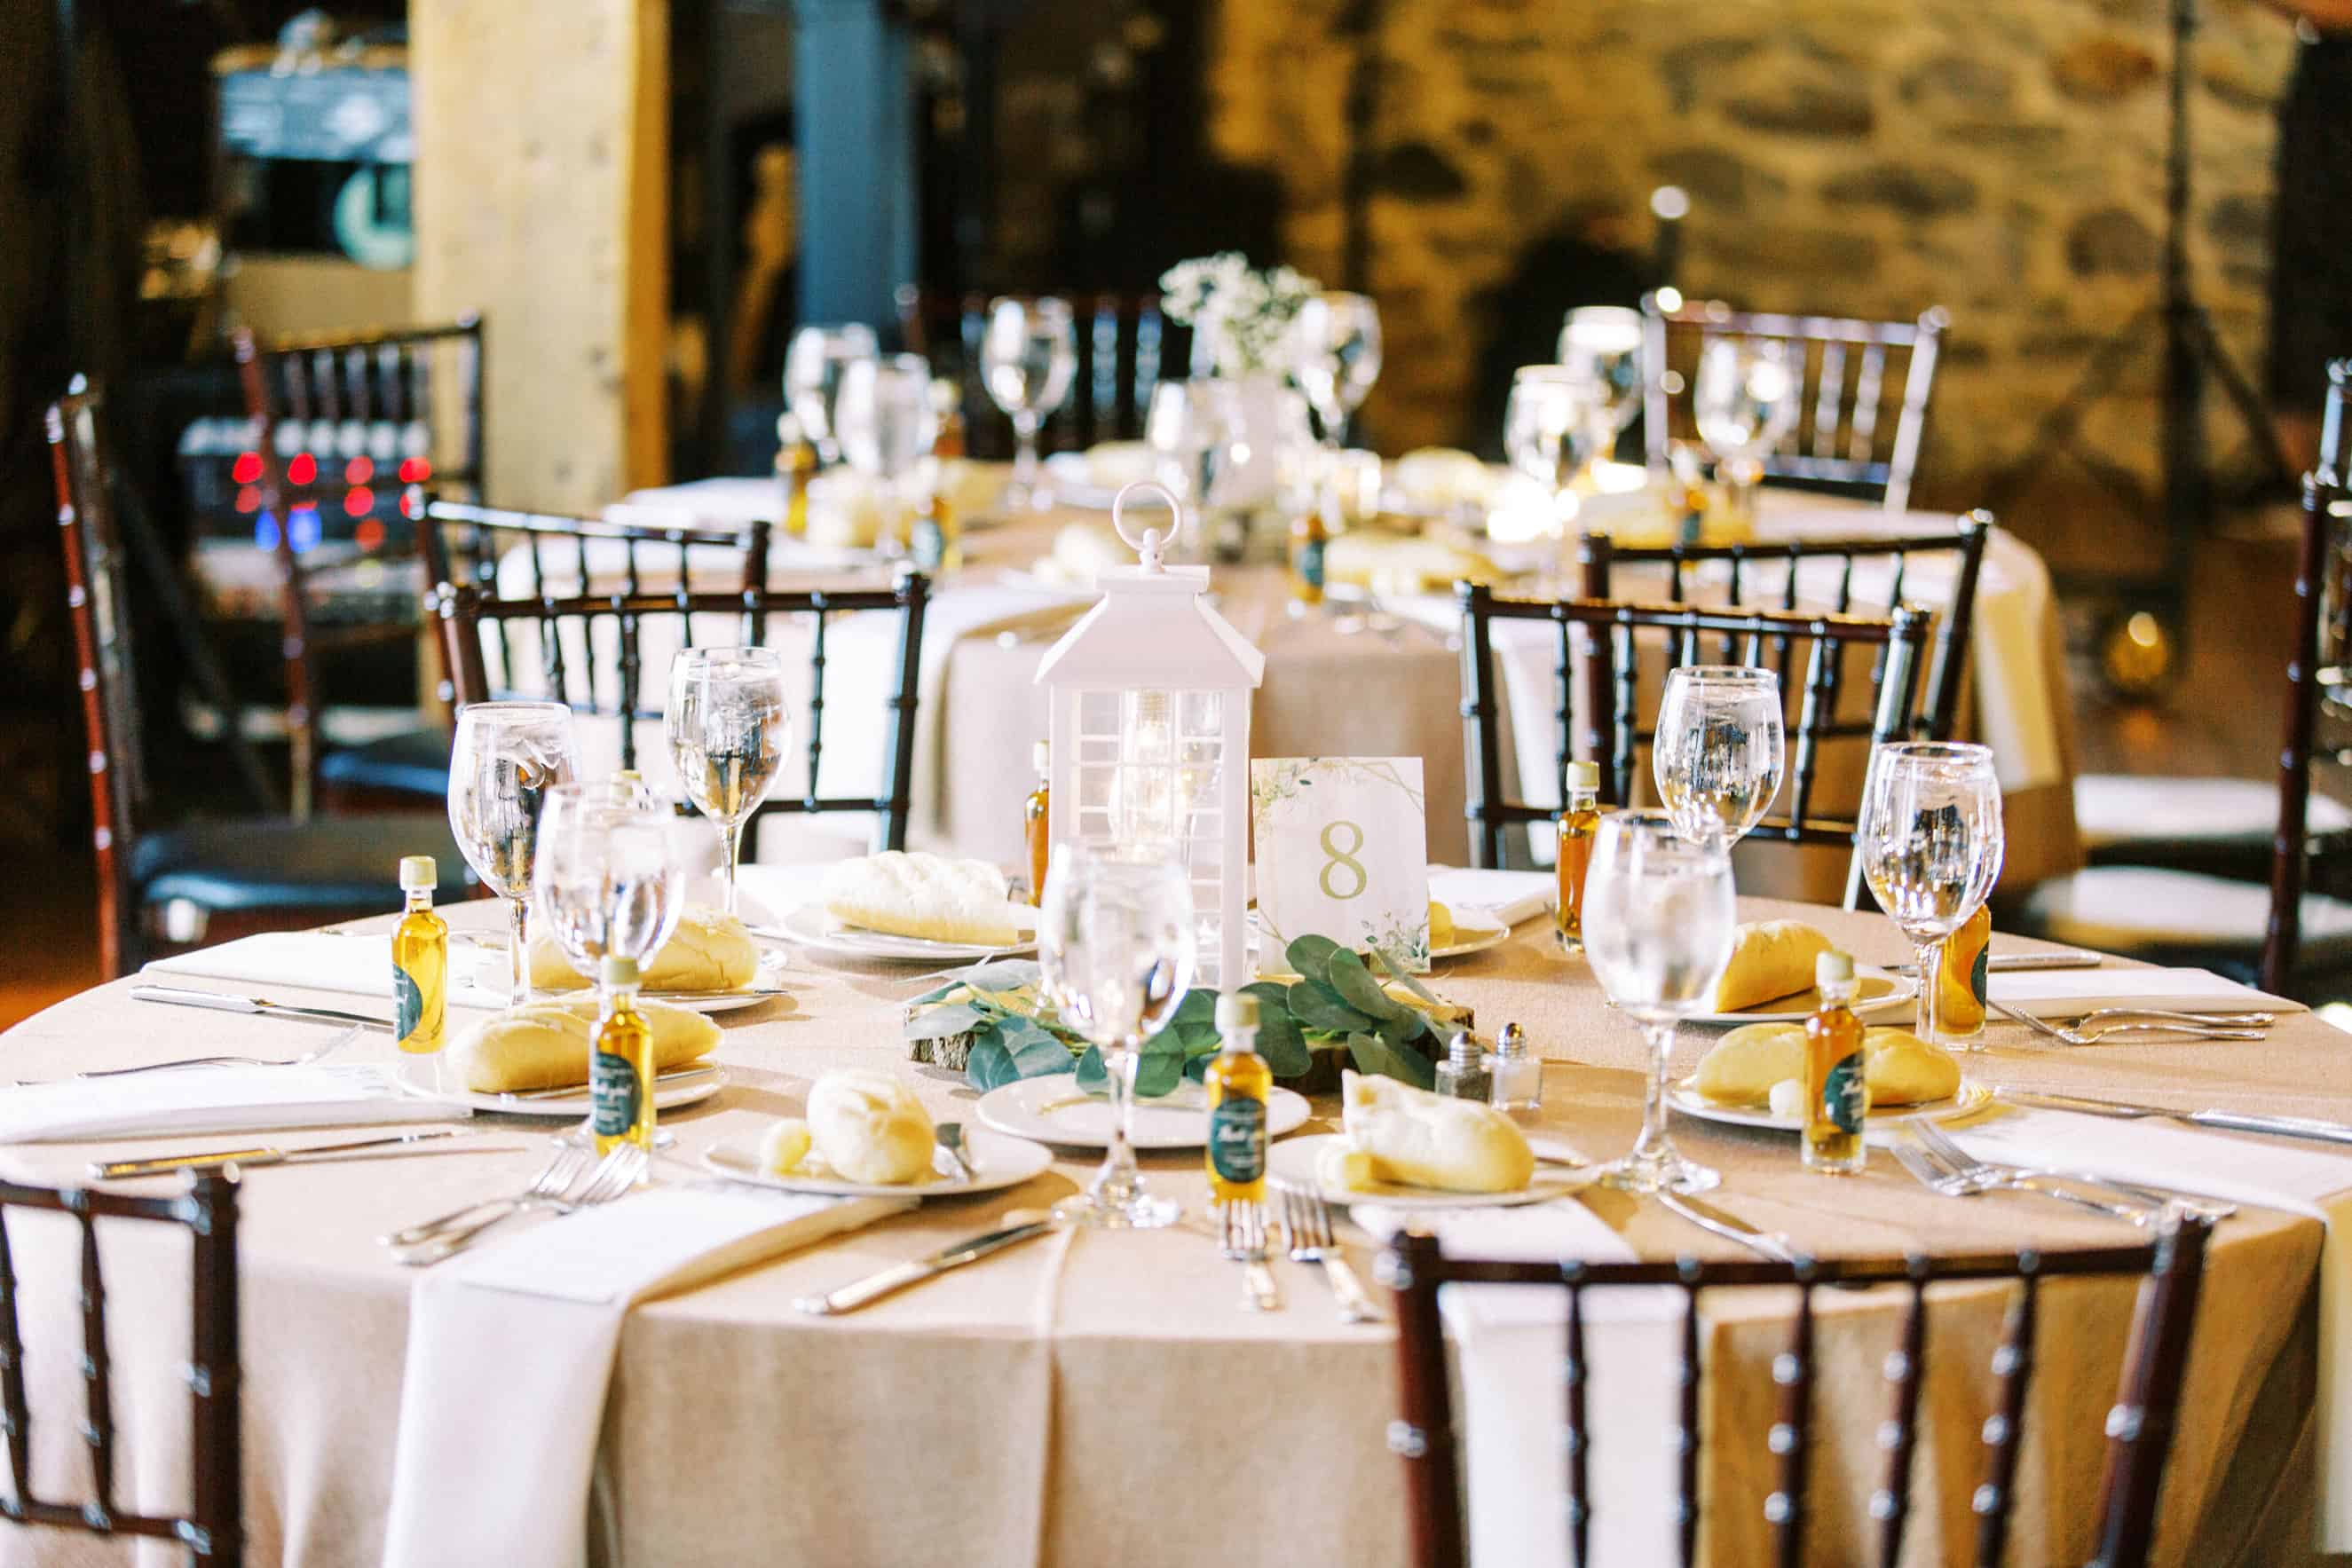 Wedding Reception photos at Harvest View Barn at Hershey Farms